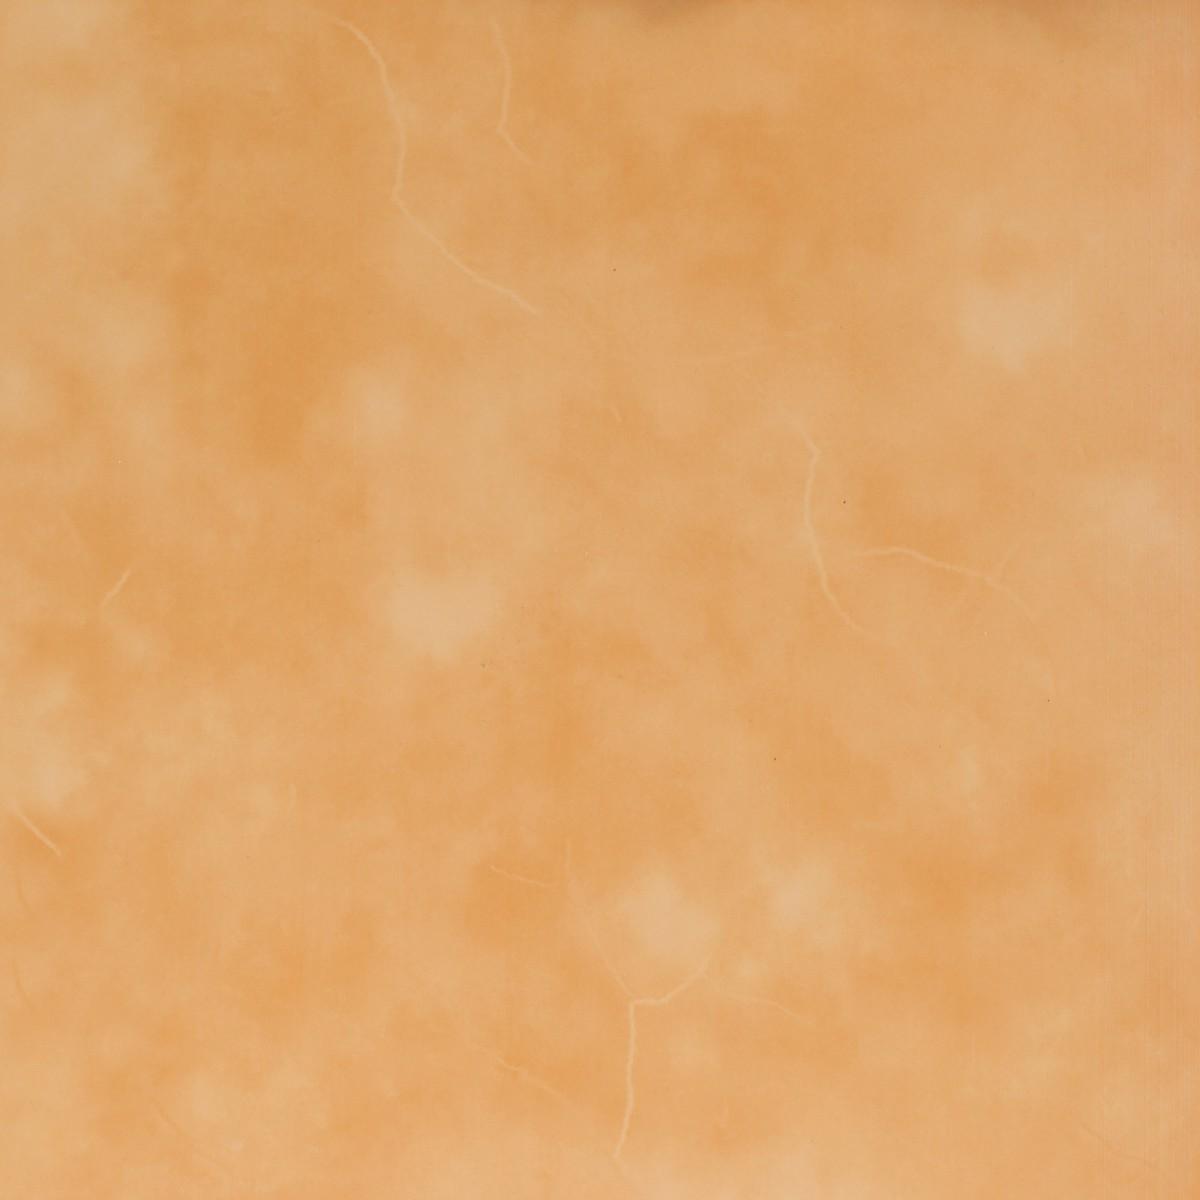 Плитка напольная Валентино 33х33 см 1 м2 цвет бежевый